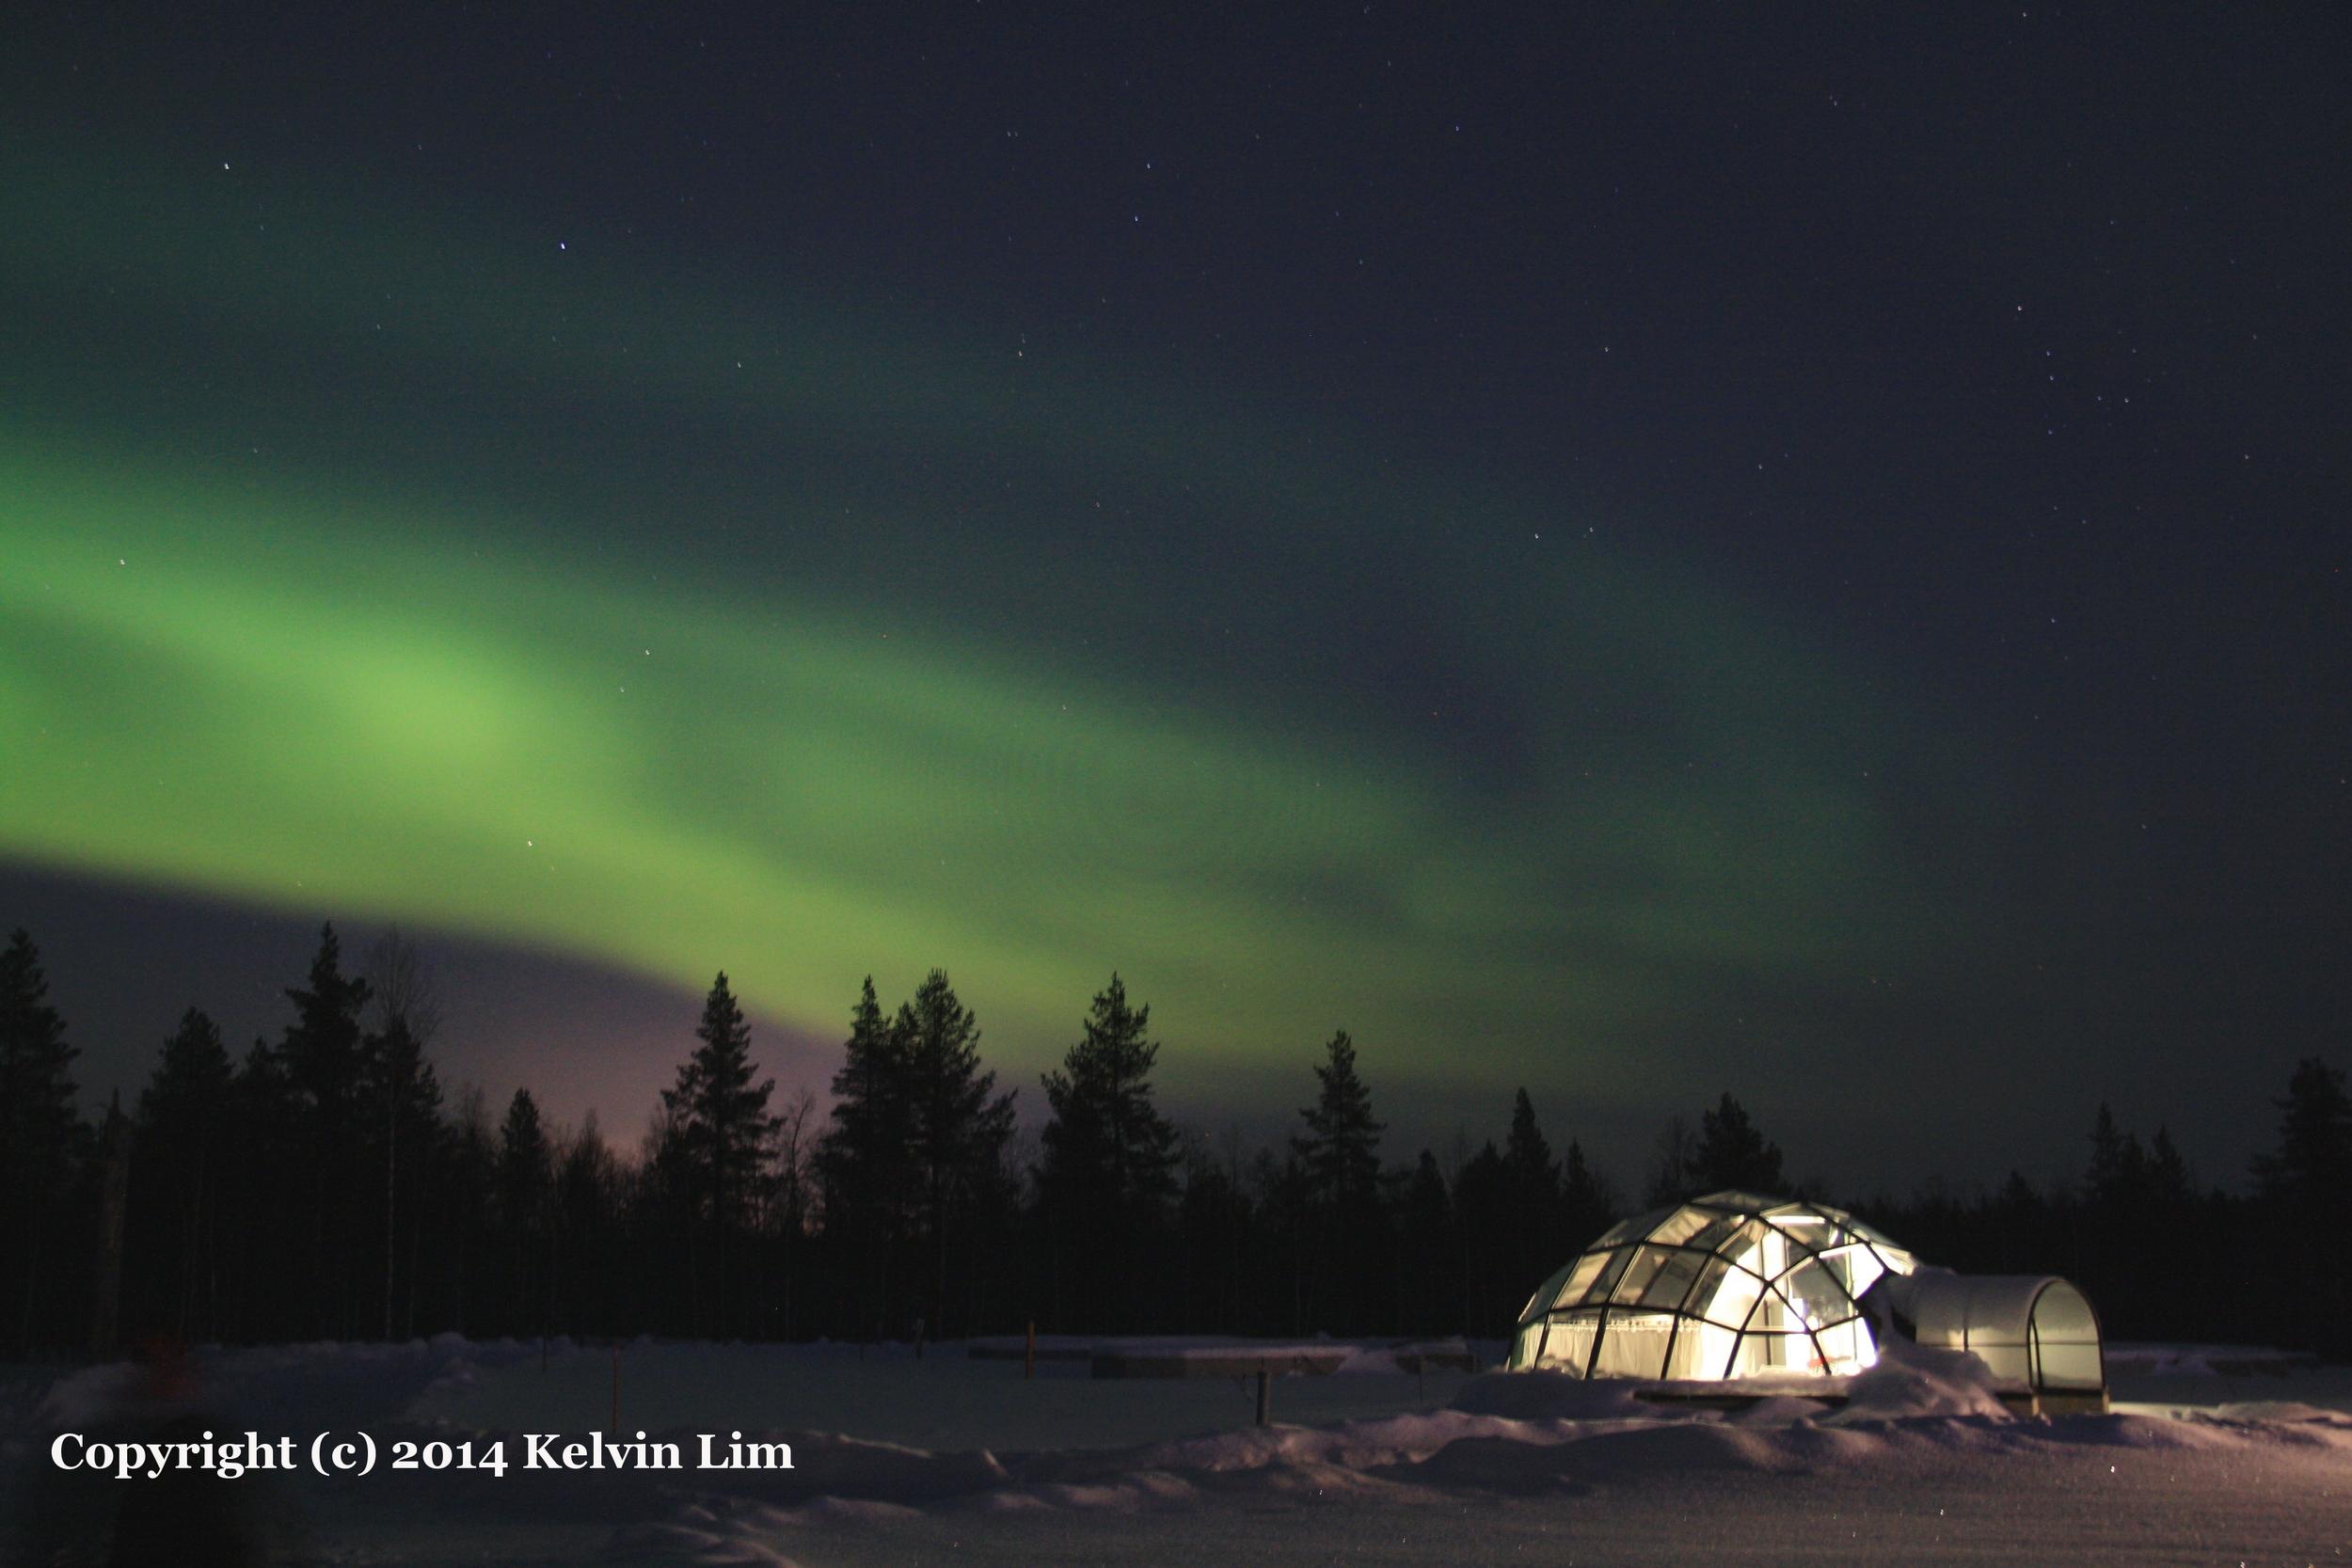 zorza polarna noc finlandia hotel igloo